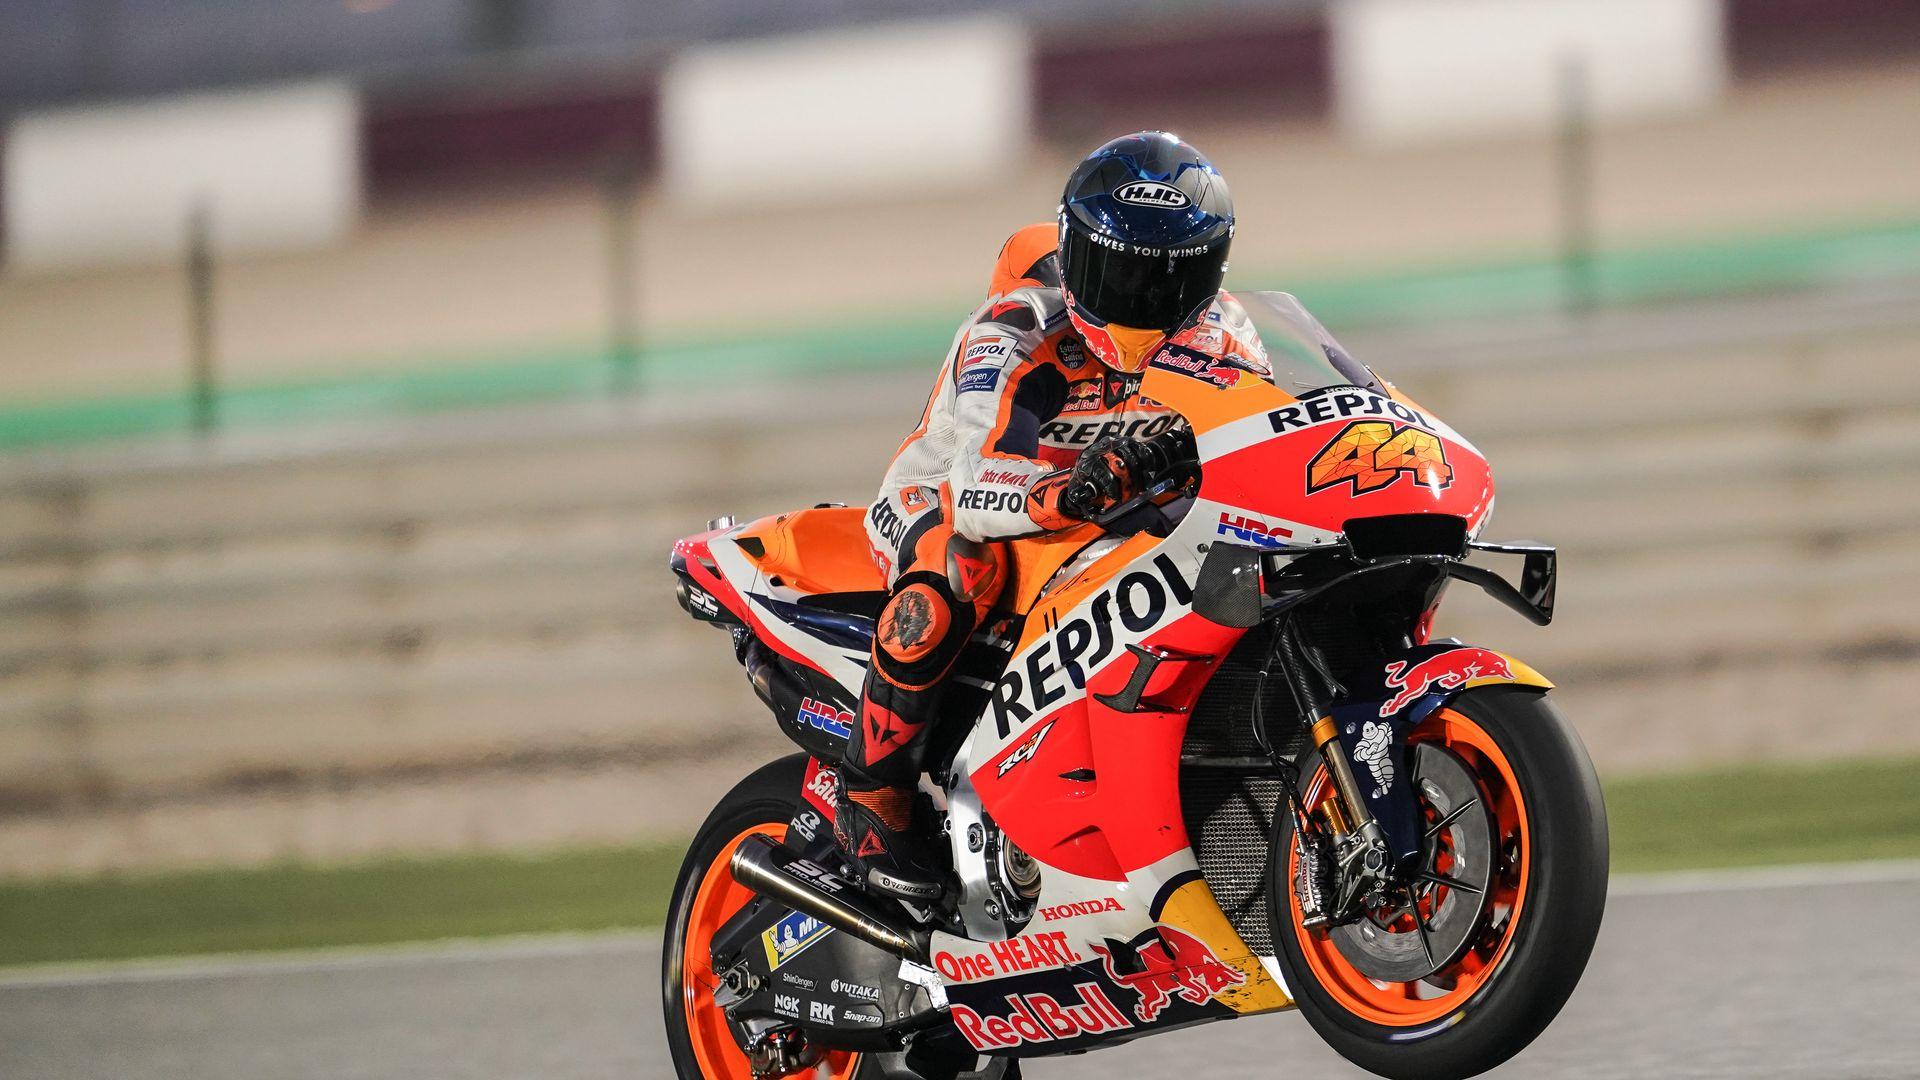 1920x1080 Wallpaper honda, motorcycle, motorcyclist, helmet, speed, track, orange